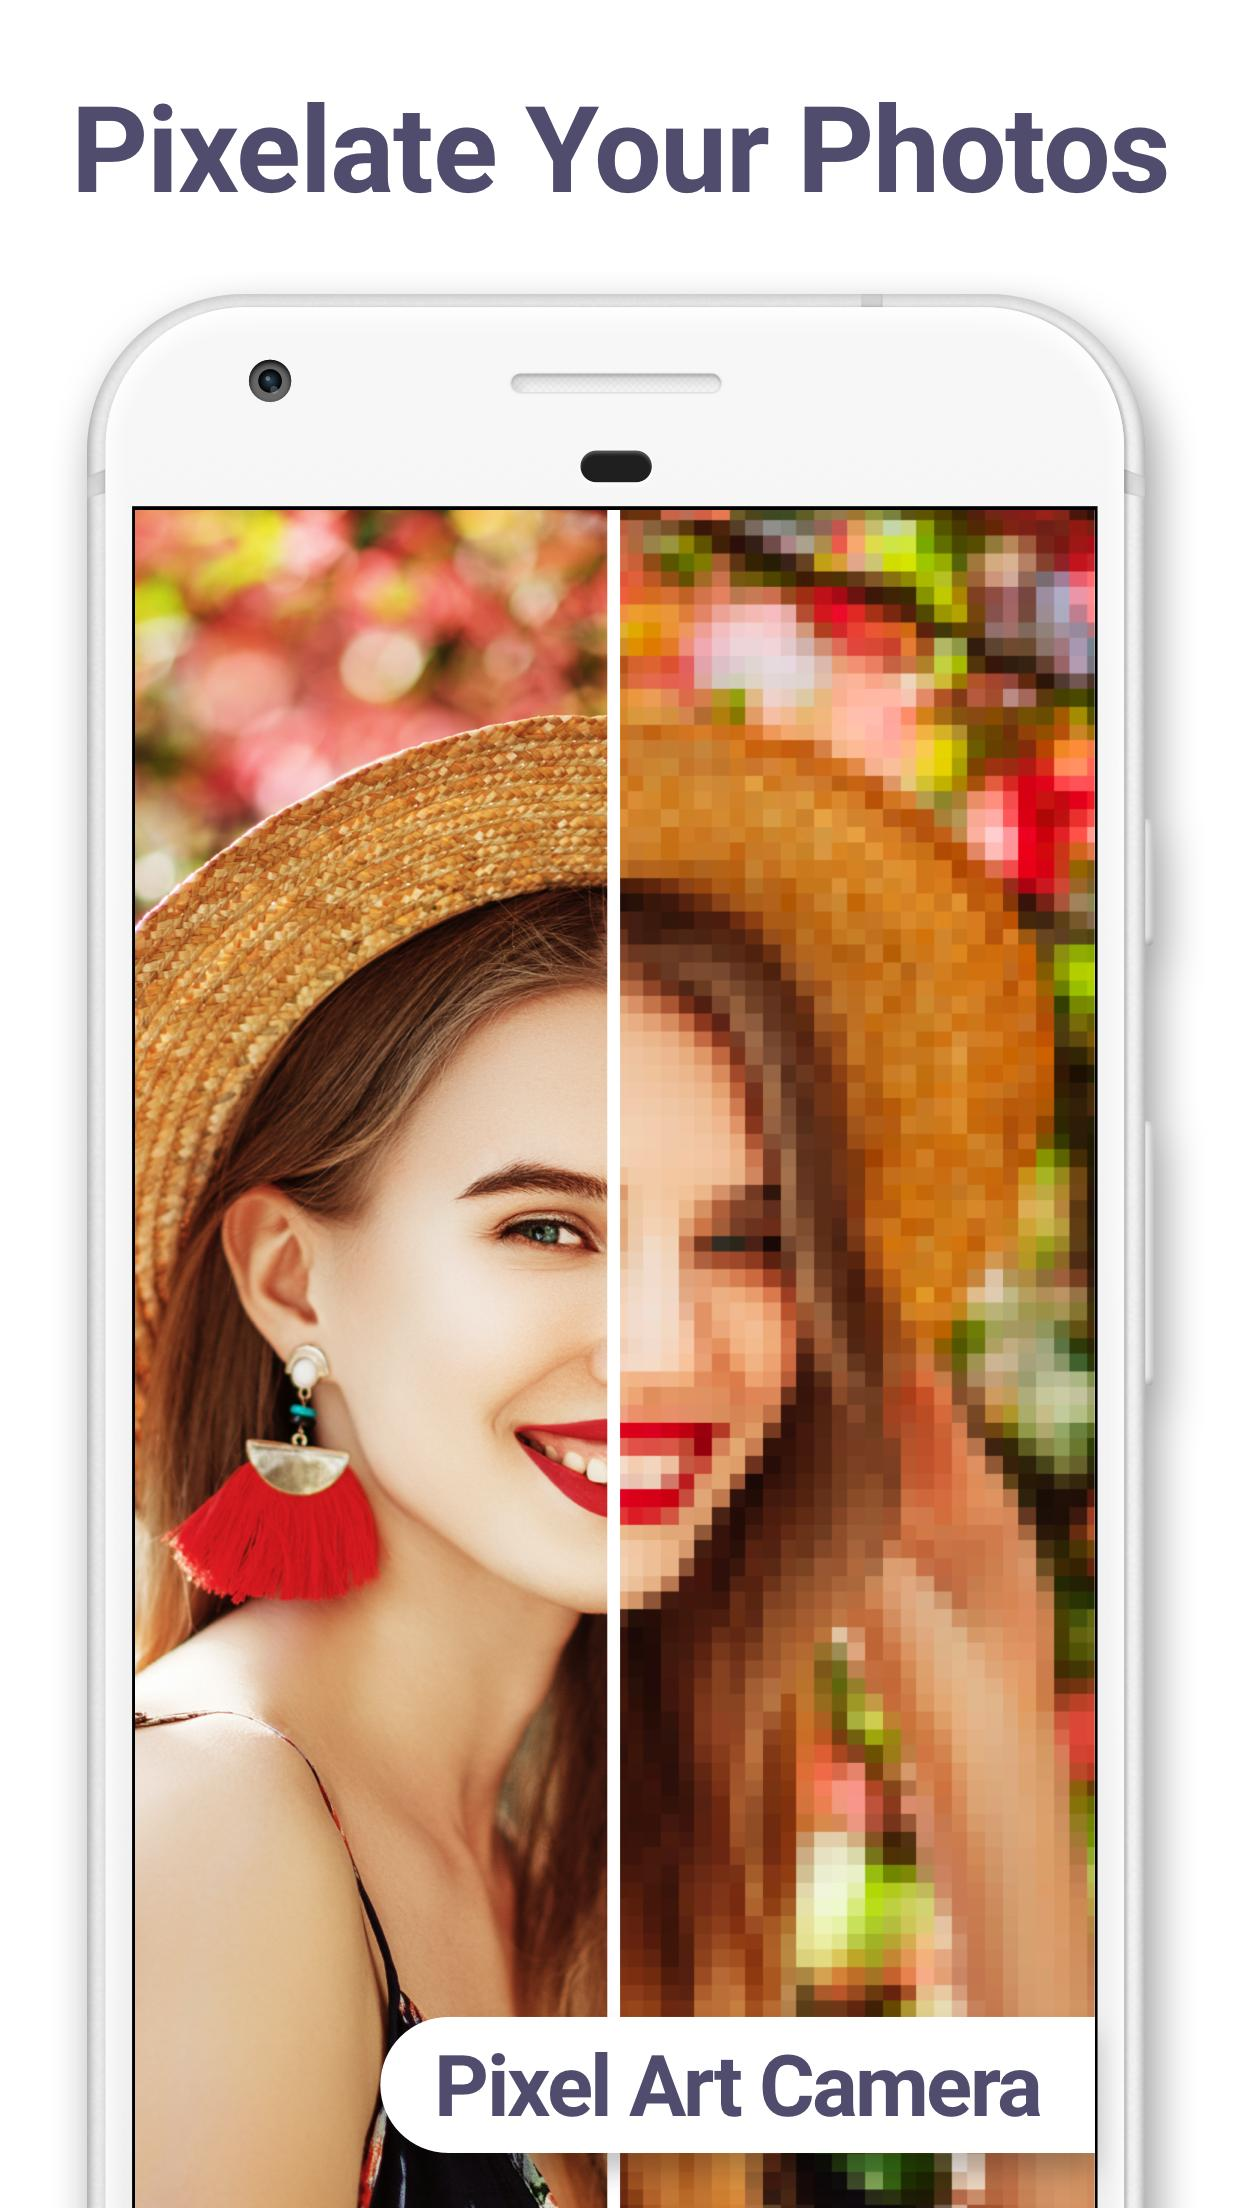 Pixel Art Color by Number 6.6.1 Screenshot 6